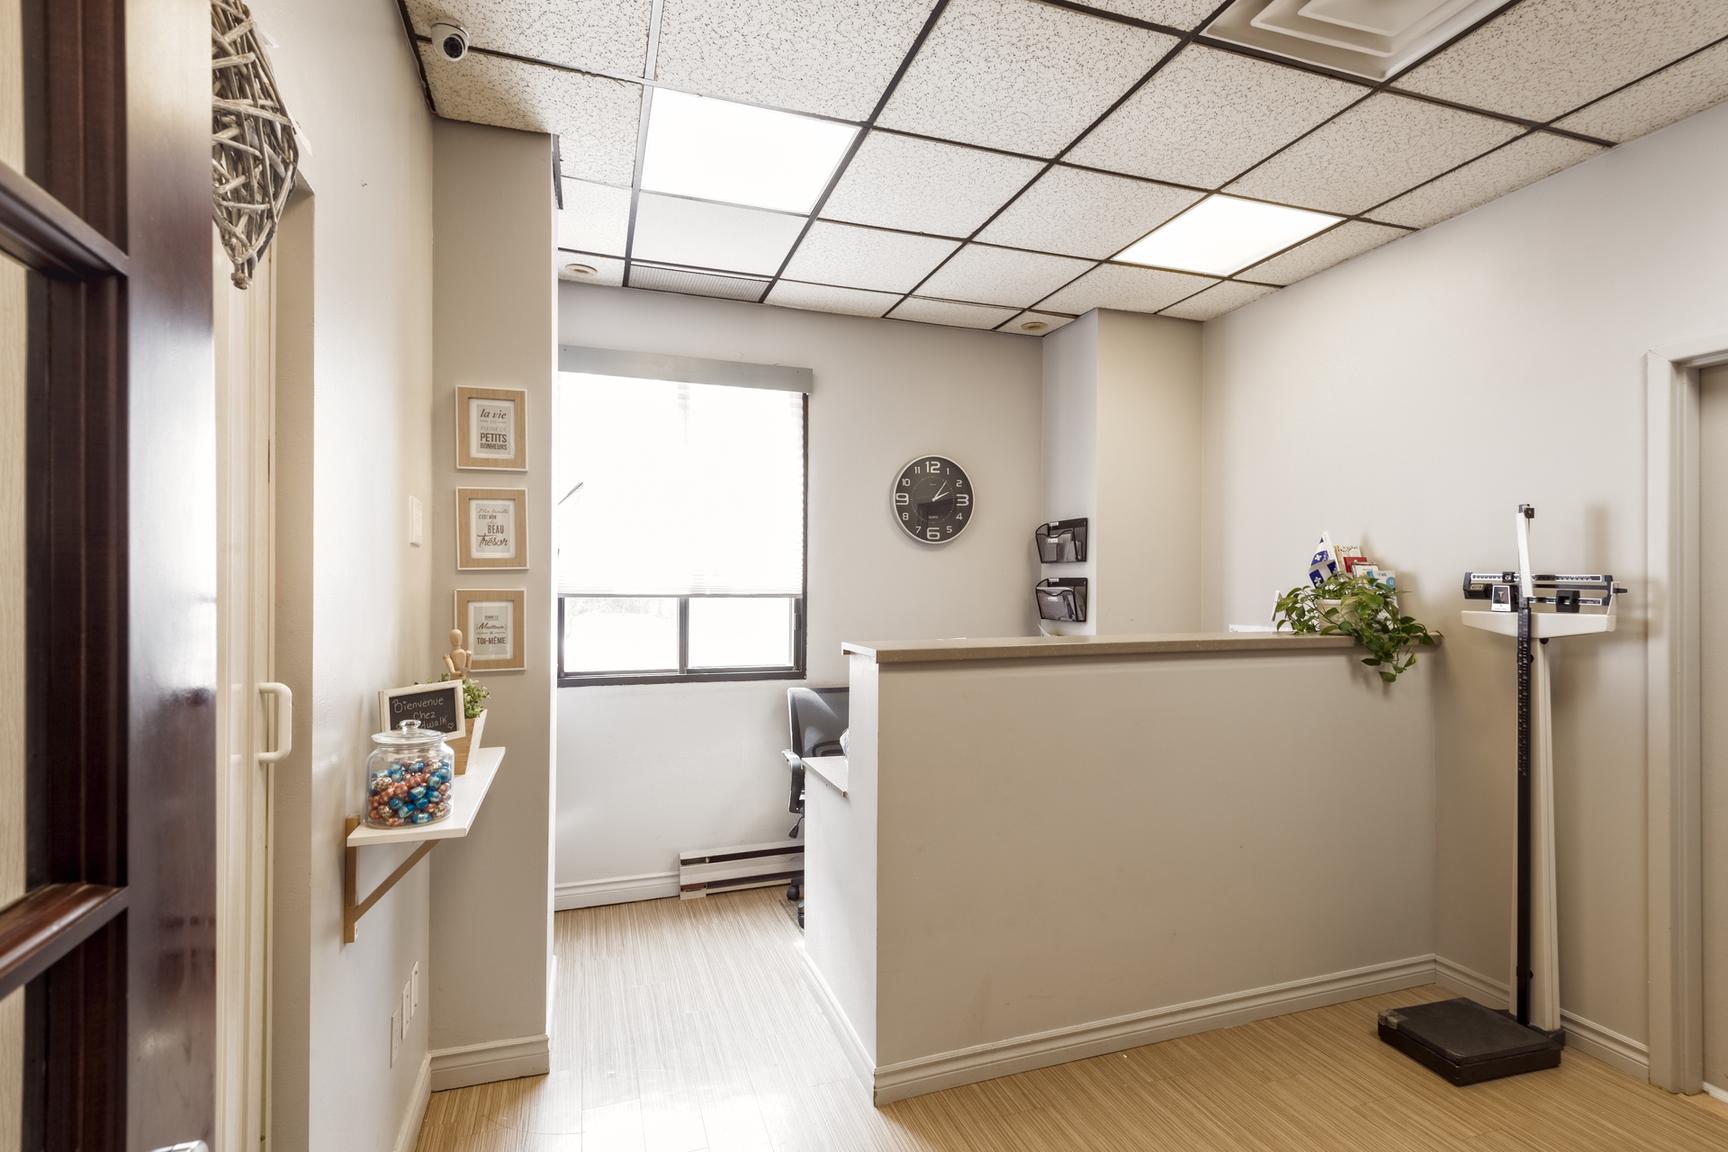 1 bedroom Apartments for rent in Laval at Le Quatre Cent - Photo 32 - RentQuebecApartments – L407183